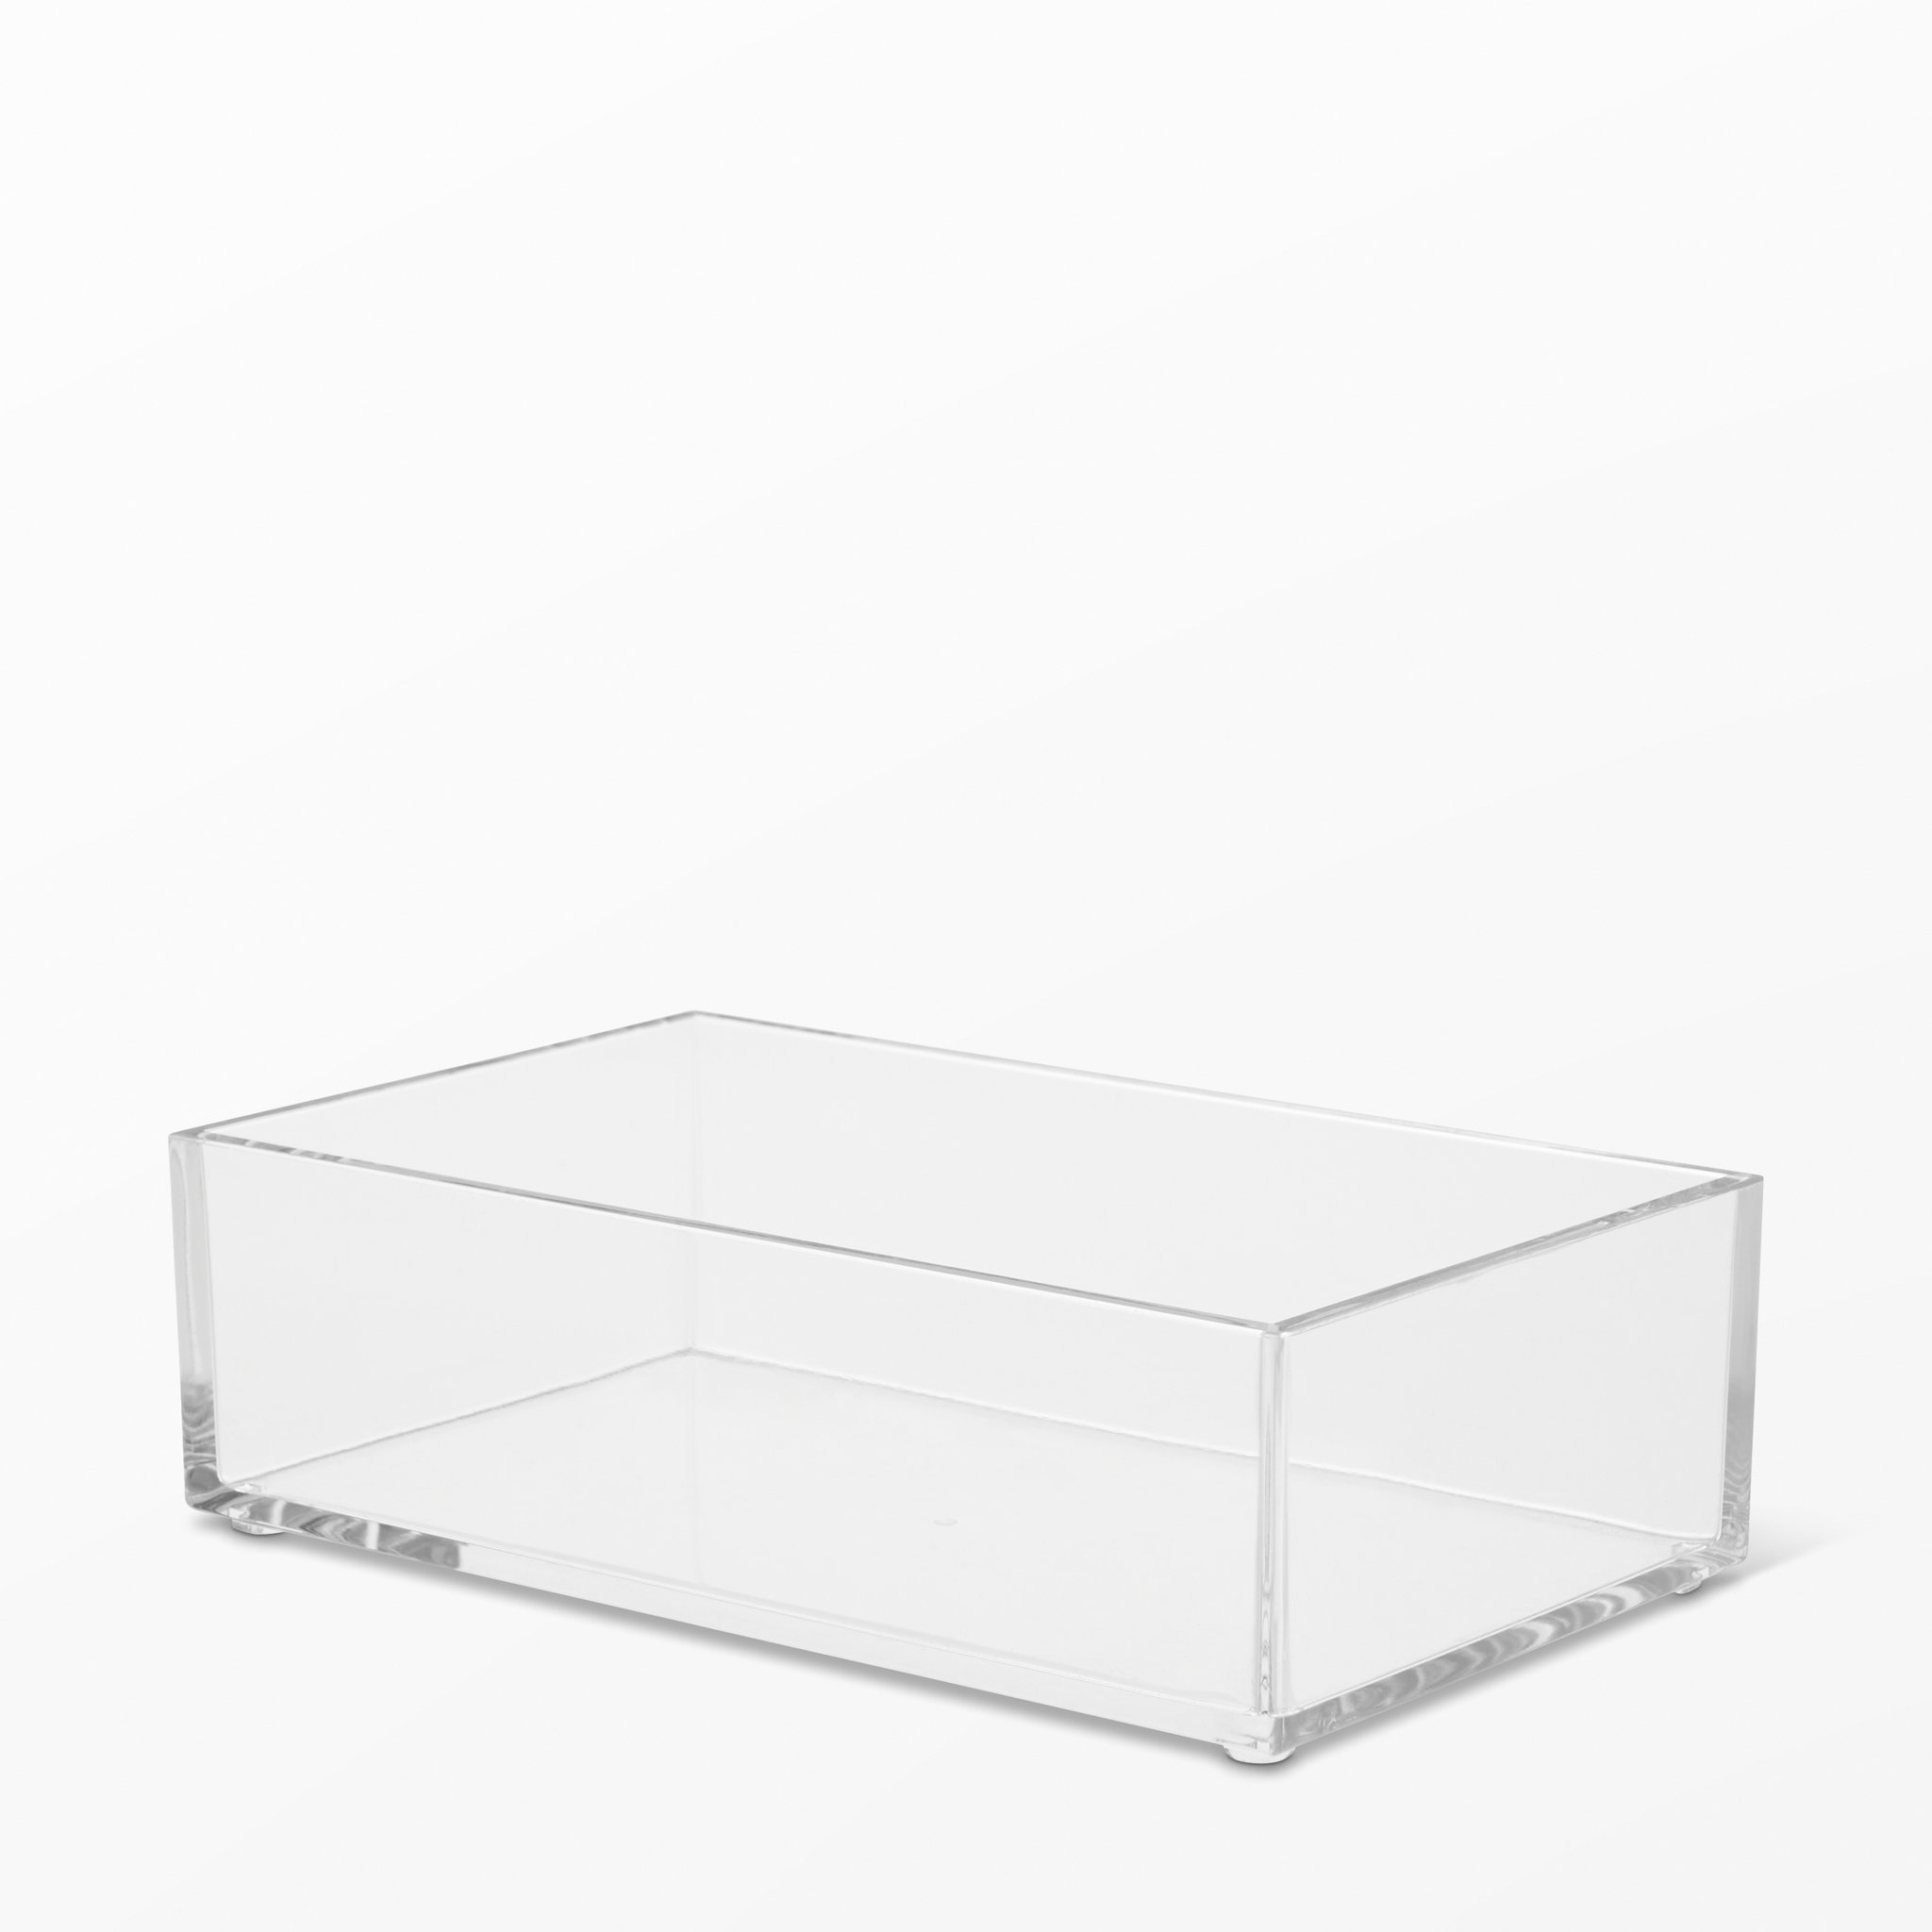 Förvaringsbox Saltsjön, 16x9,5 cm